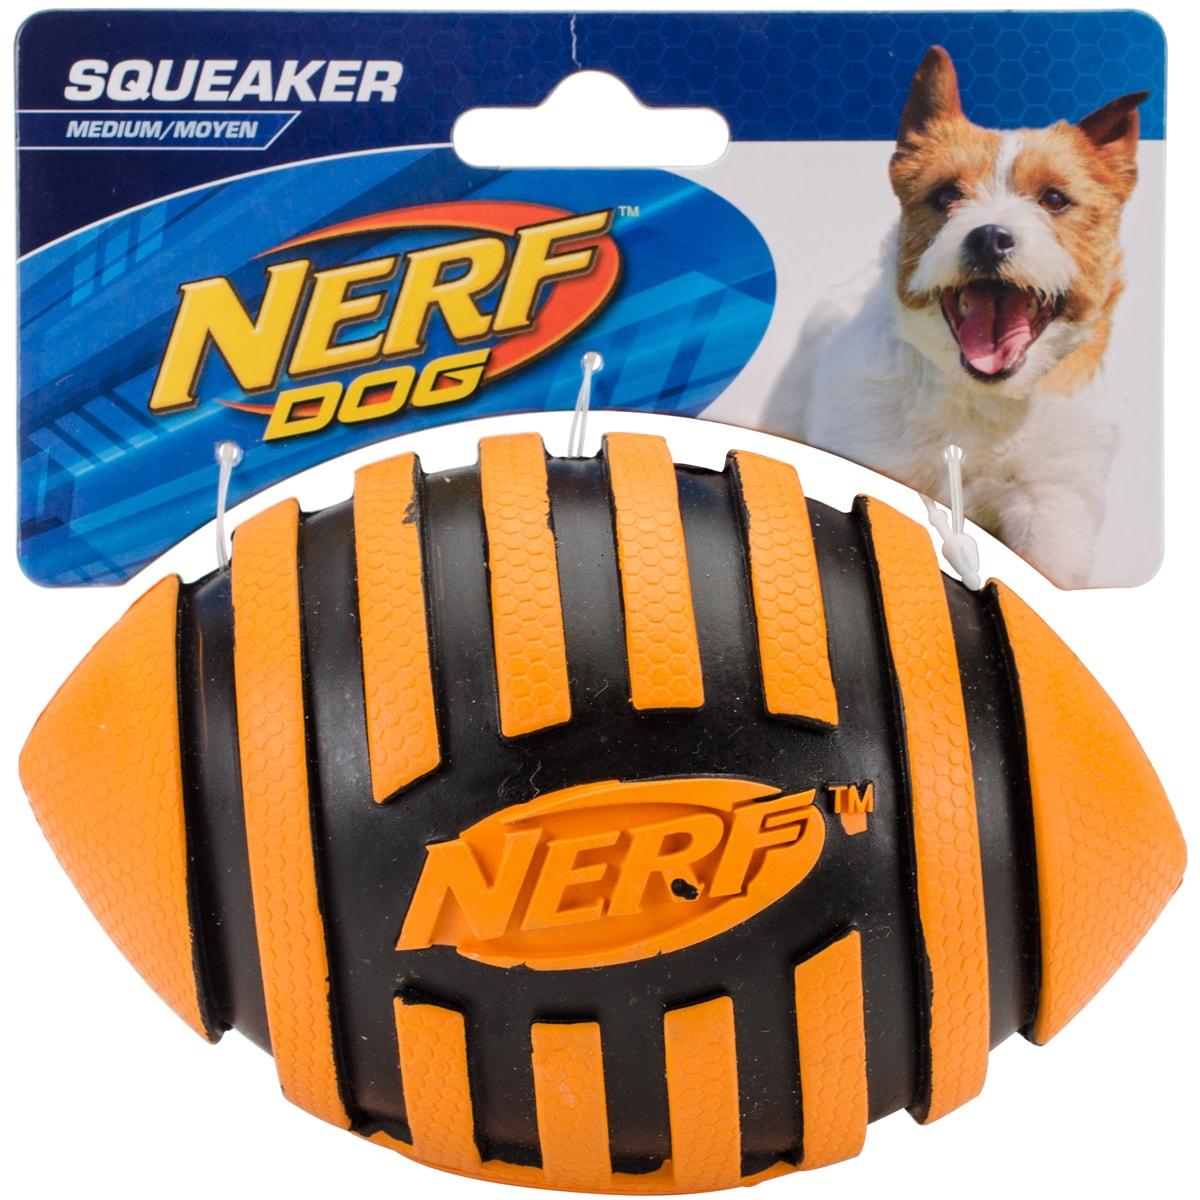 Nerf Spiral Dog Squeak Football (Orange), Multi